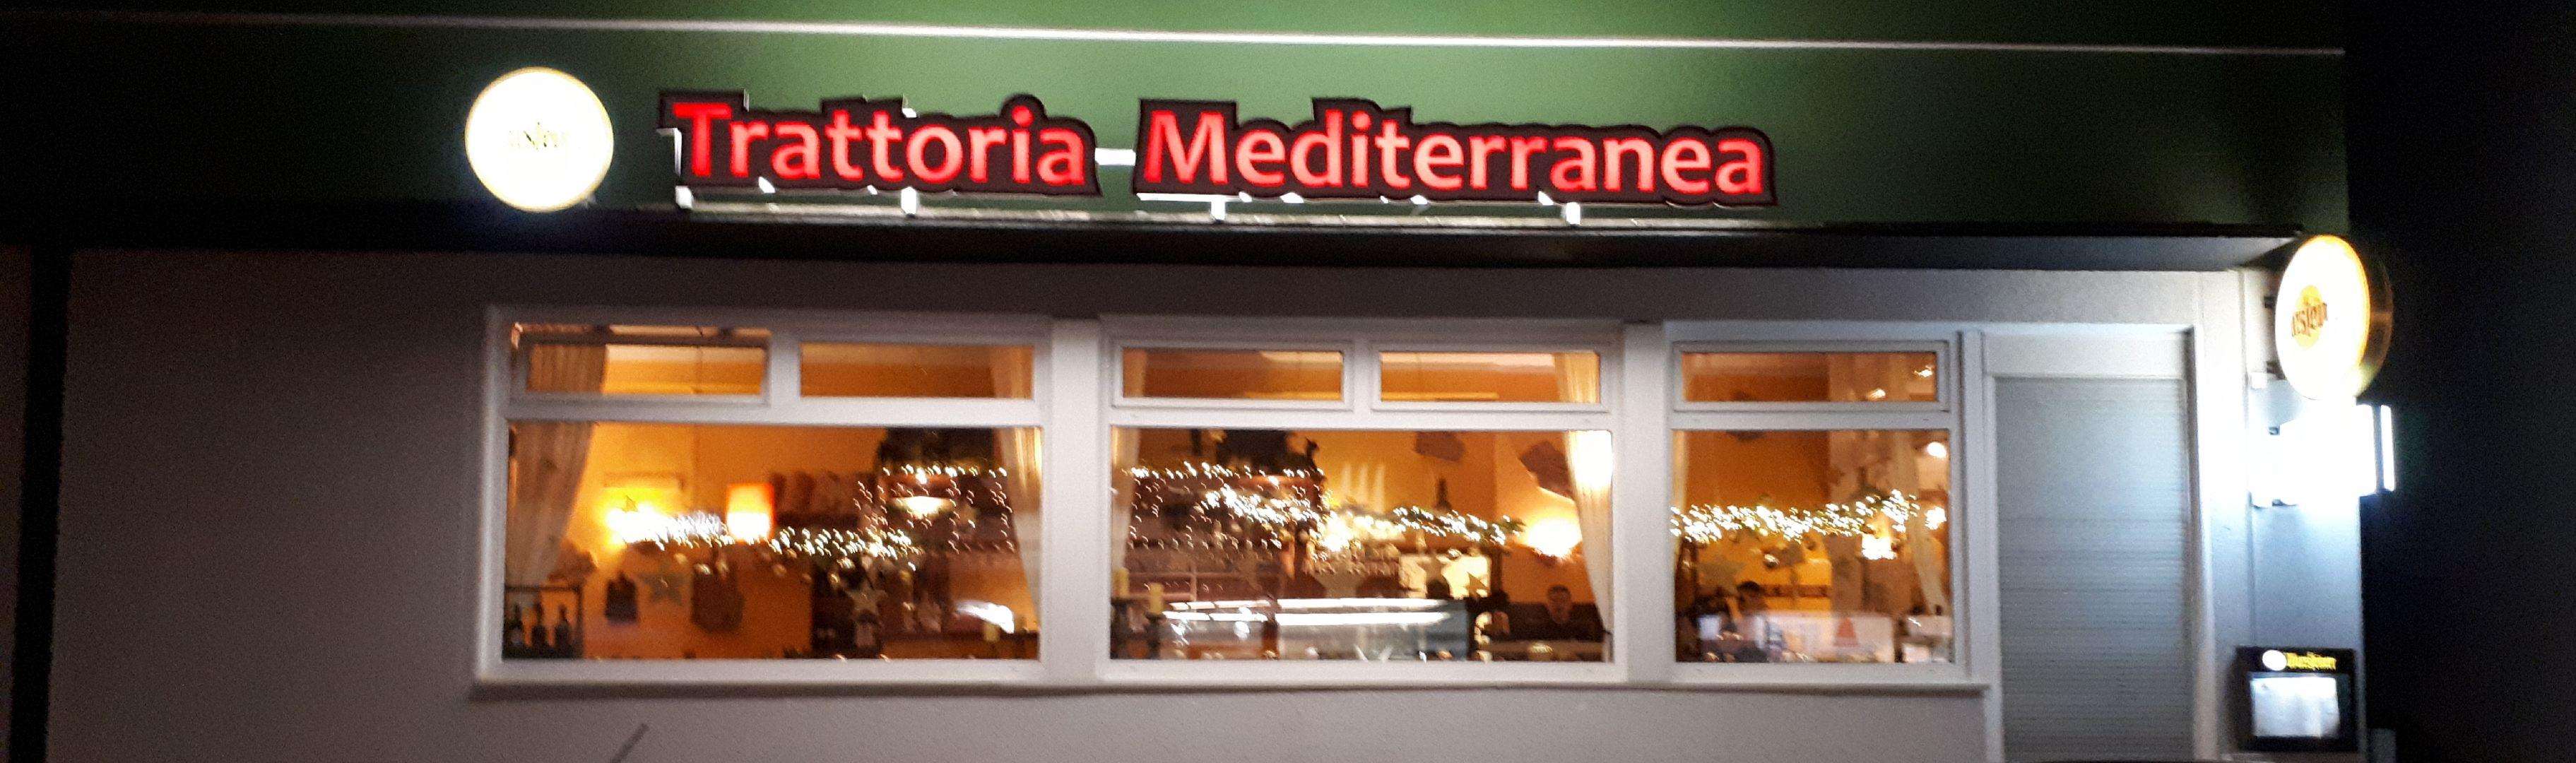 Trattoria Mediterranea | ISG Solingen-Ohligs e.V.